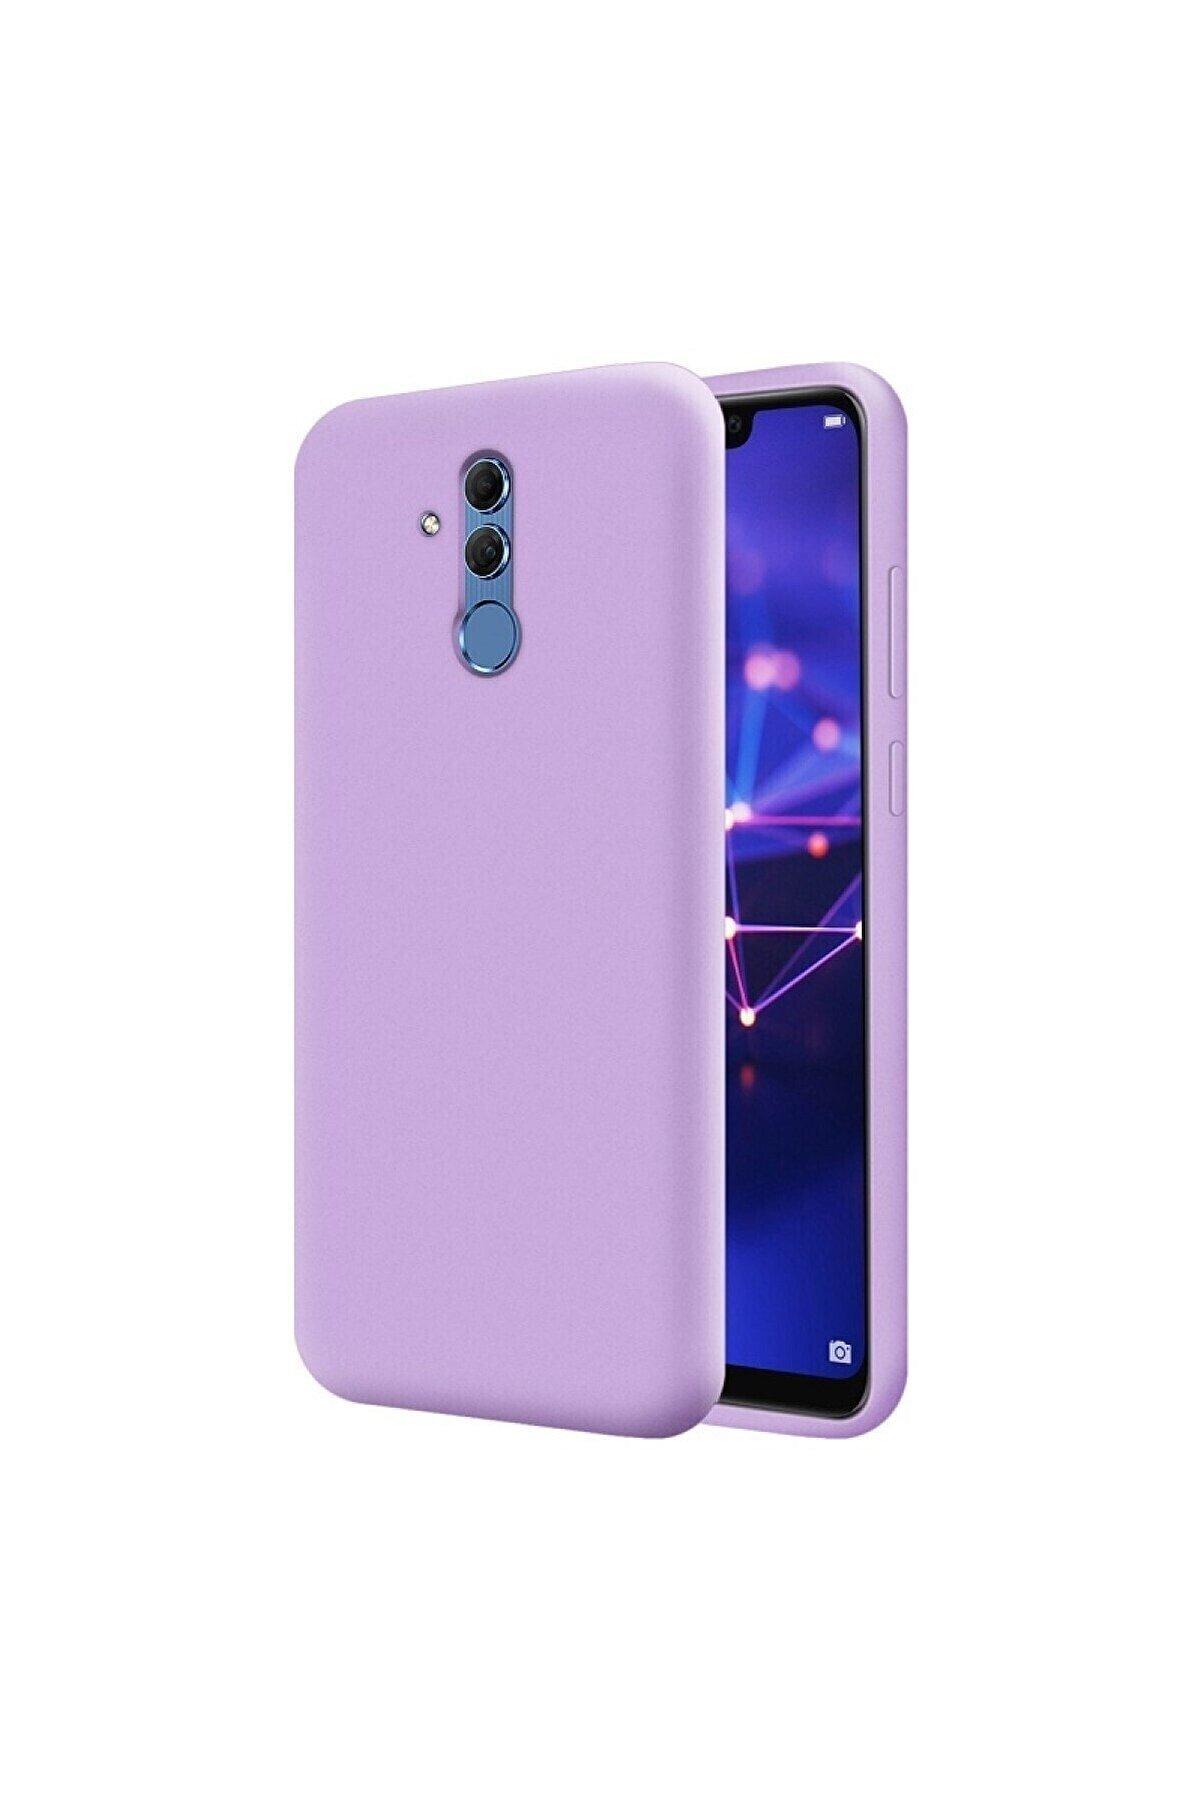 Mopal Huawei Mate 20 Lite Uyumlu Lila Içi Kadife Lansman Silikon Kılıf